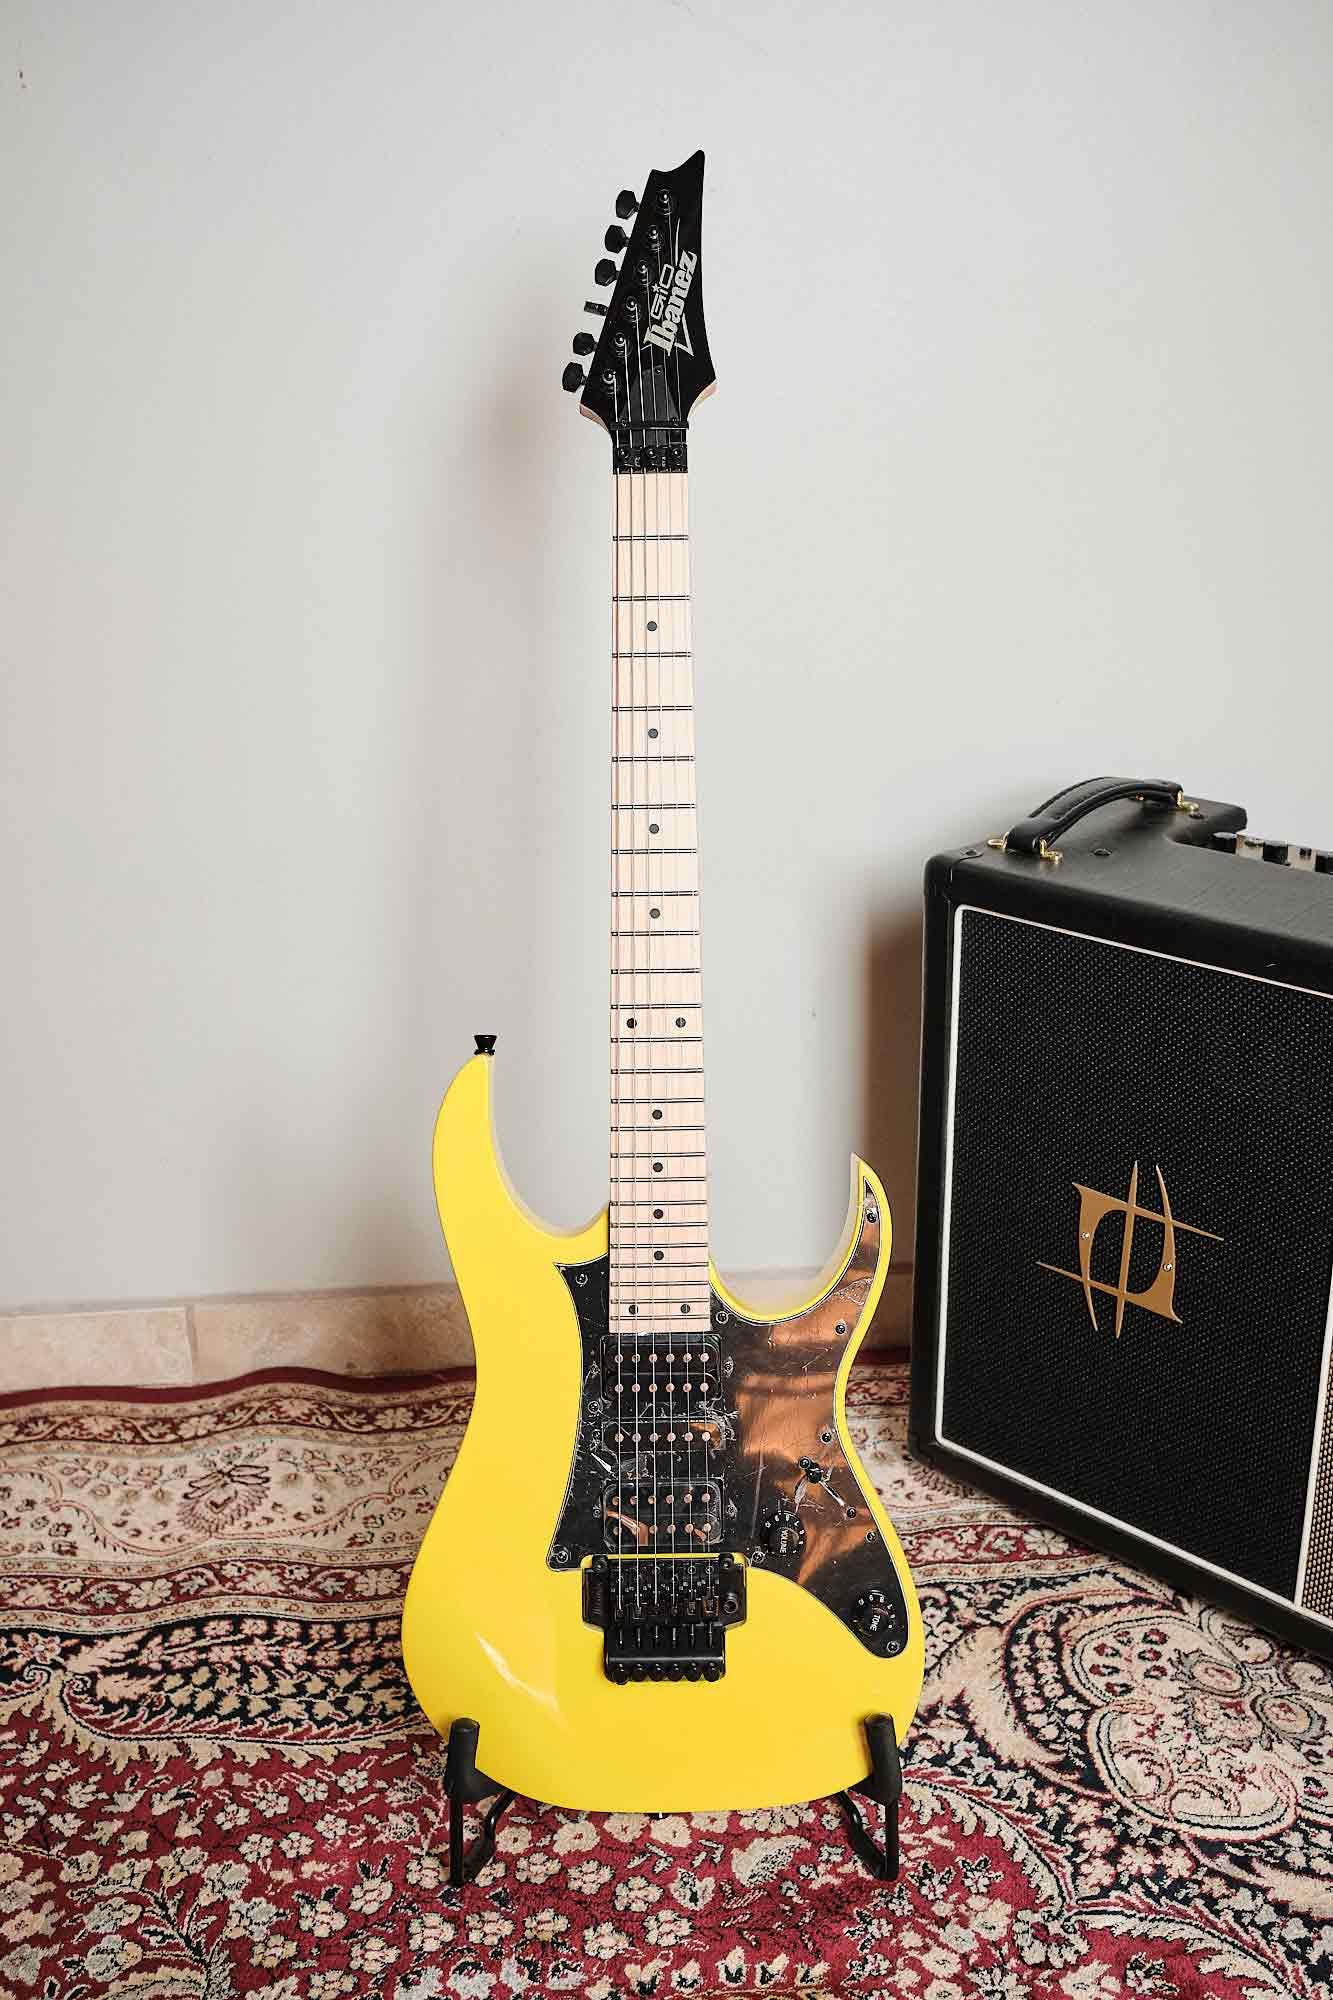 Guitarra Ibanez Grg 250m Ye Serie Gio Braço Maple / X7